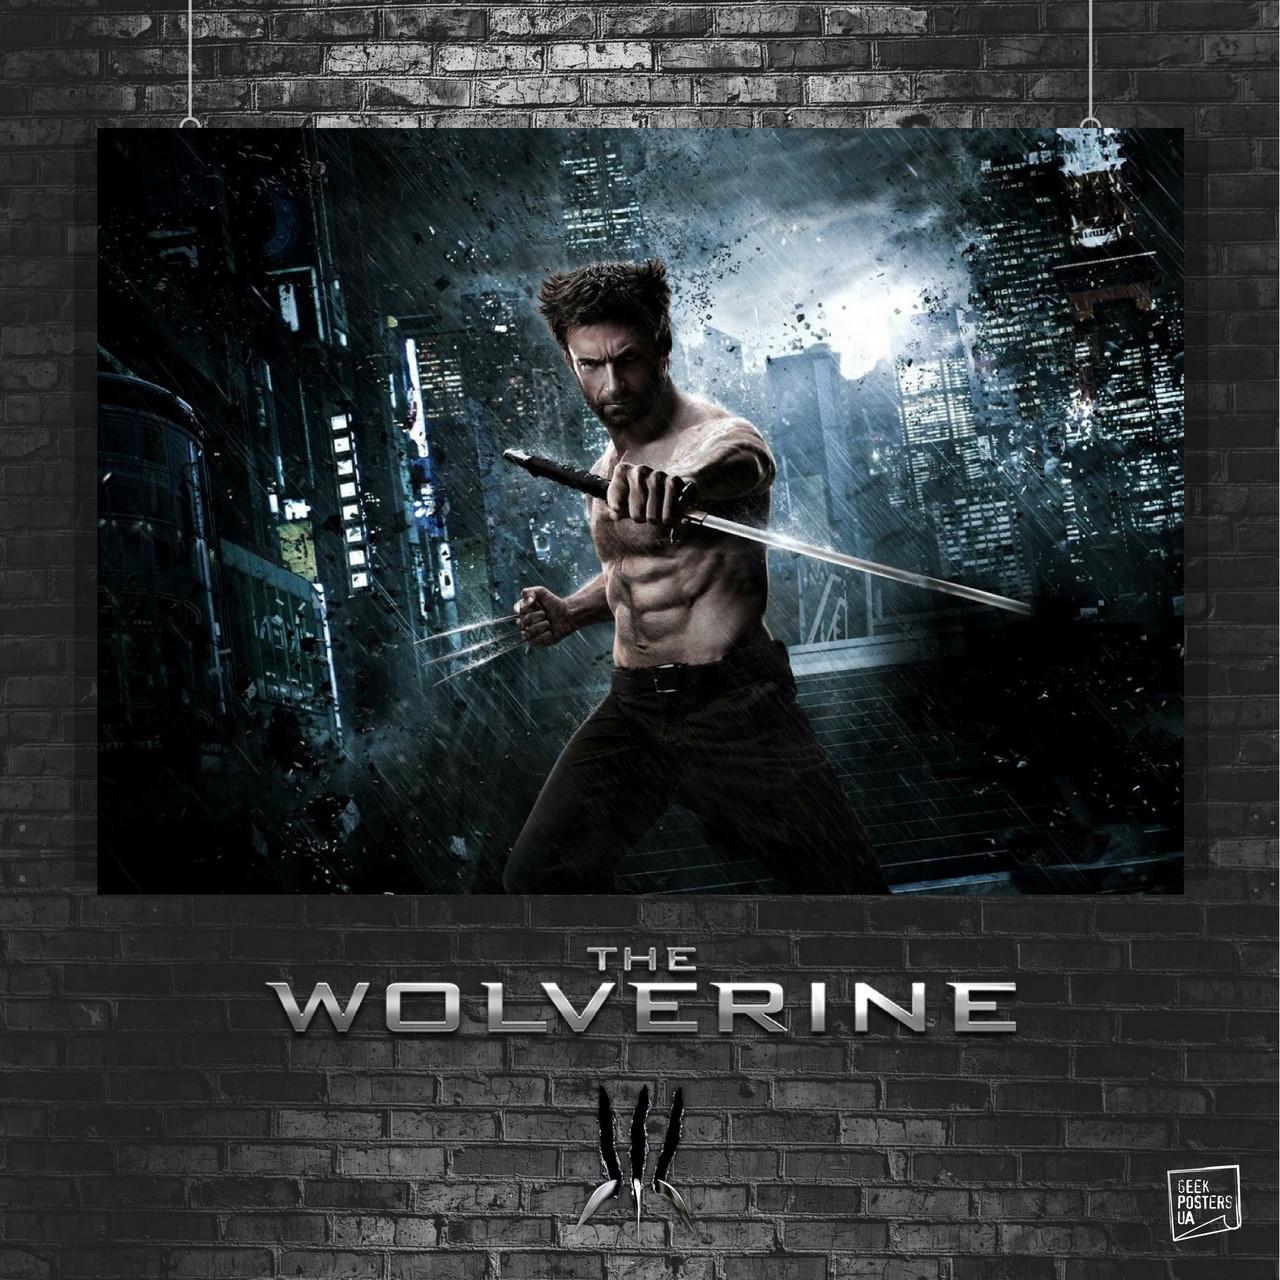 Постер Логан с мечом. Росомаха, Логан, The Wolverine. Размер 60x34см (A2). Глянцевая бумага